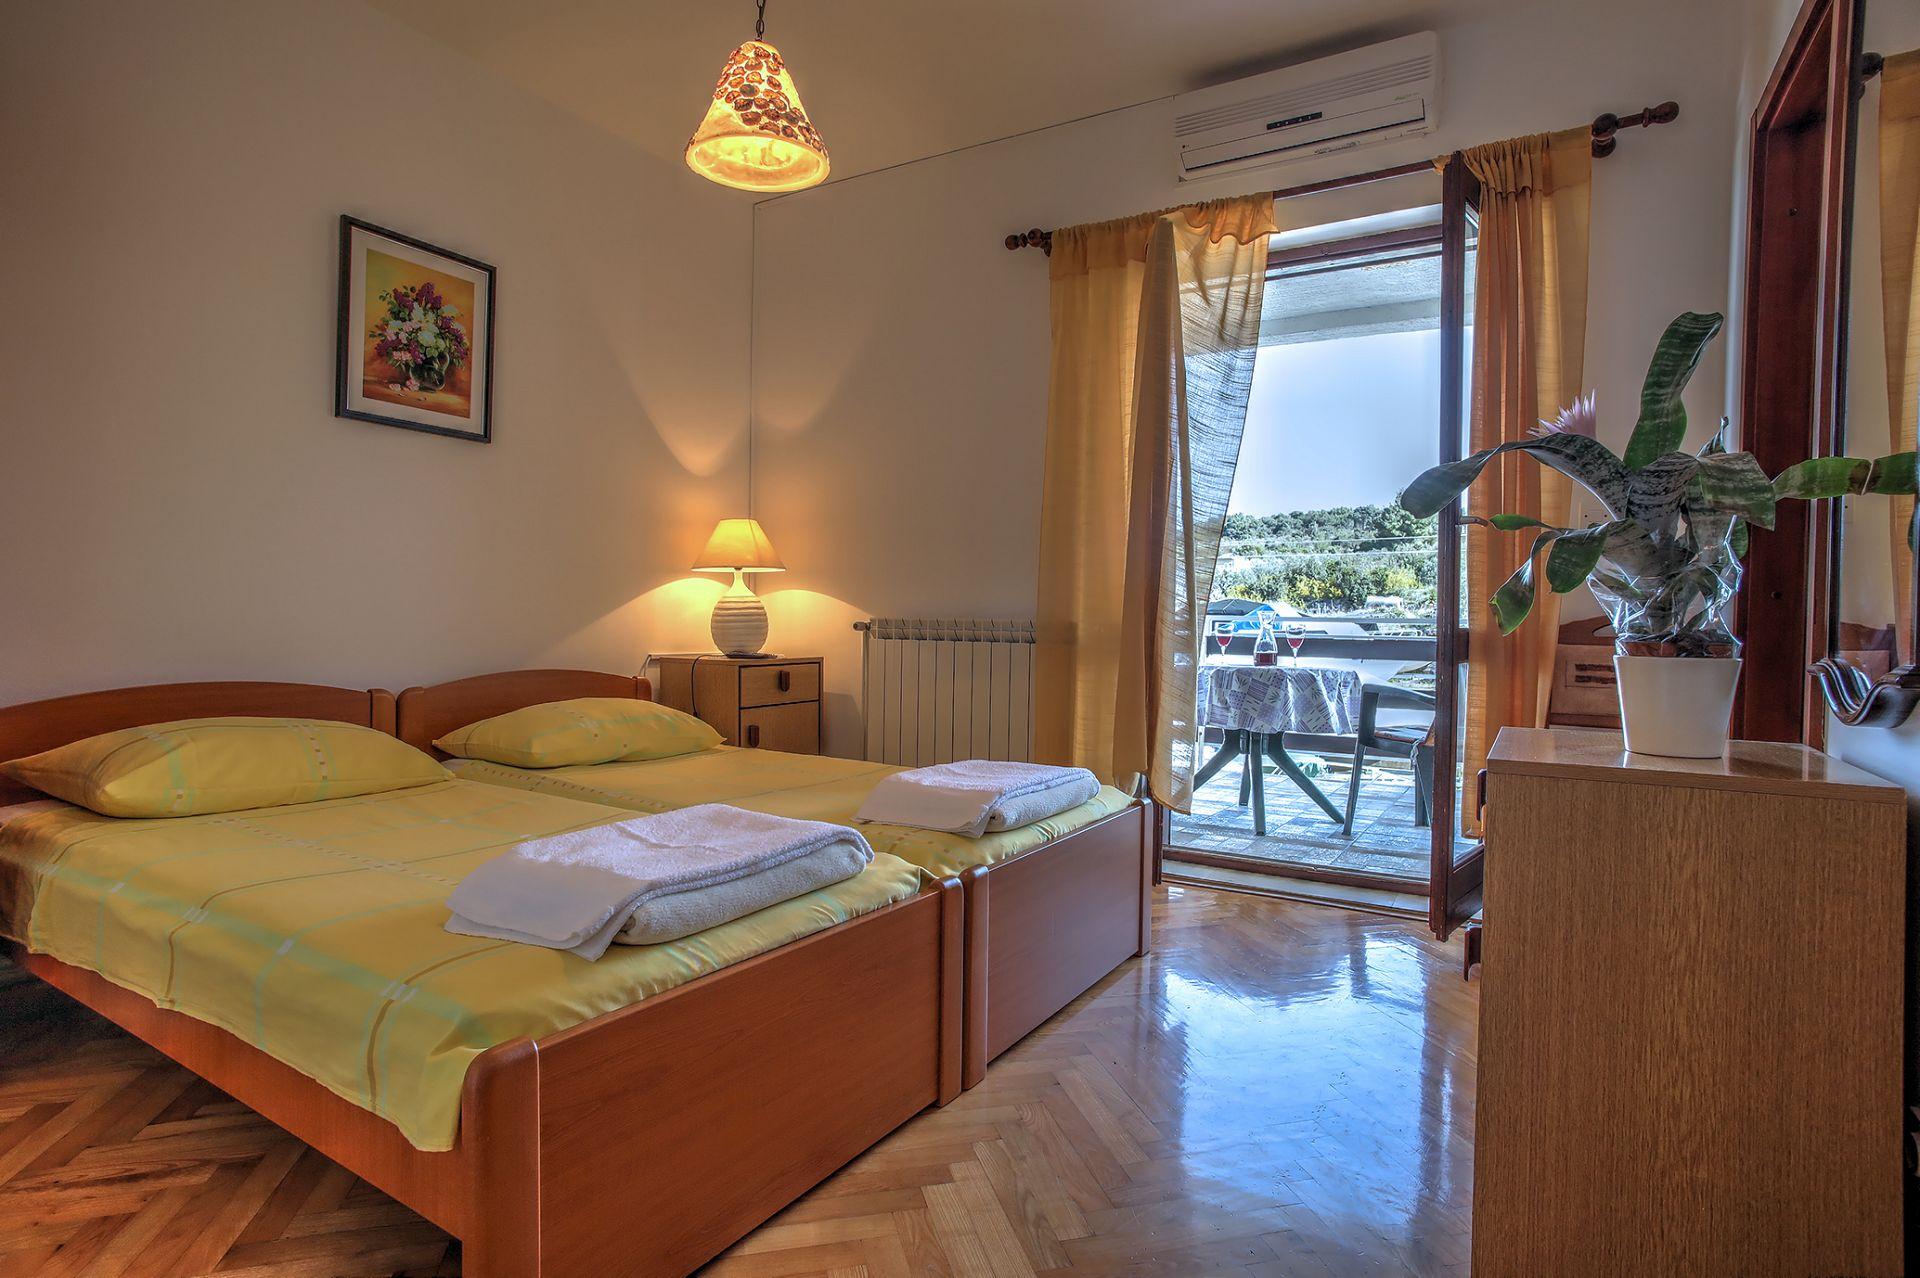 5409 - Jezera - Apartments Croatia - SA3(2): interior